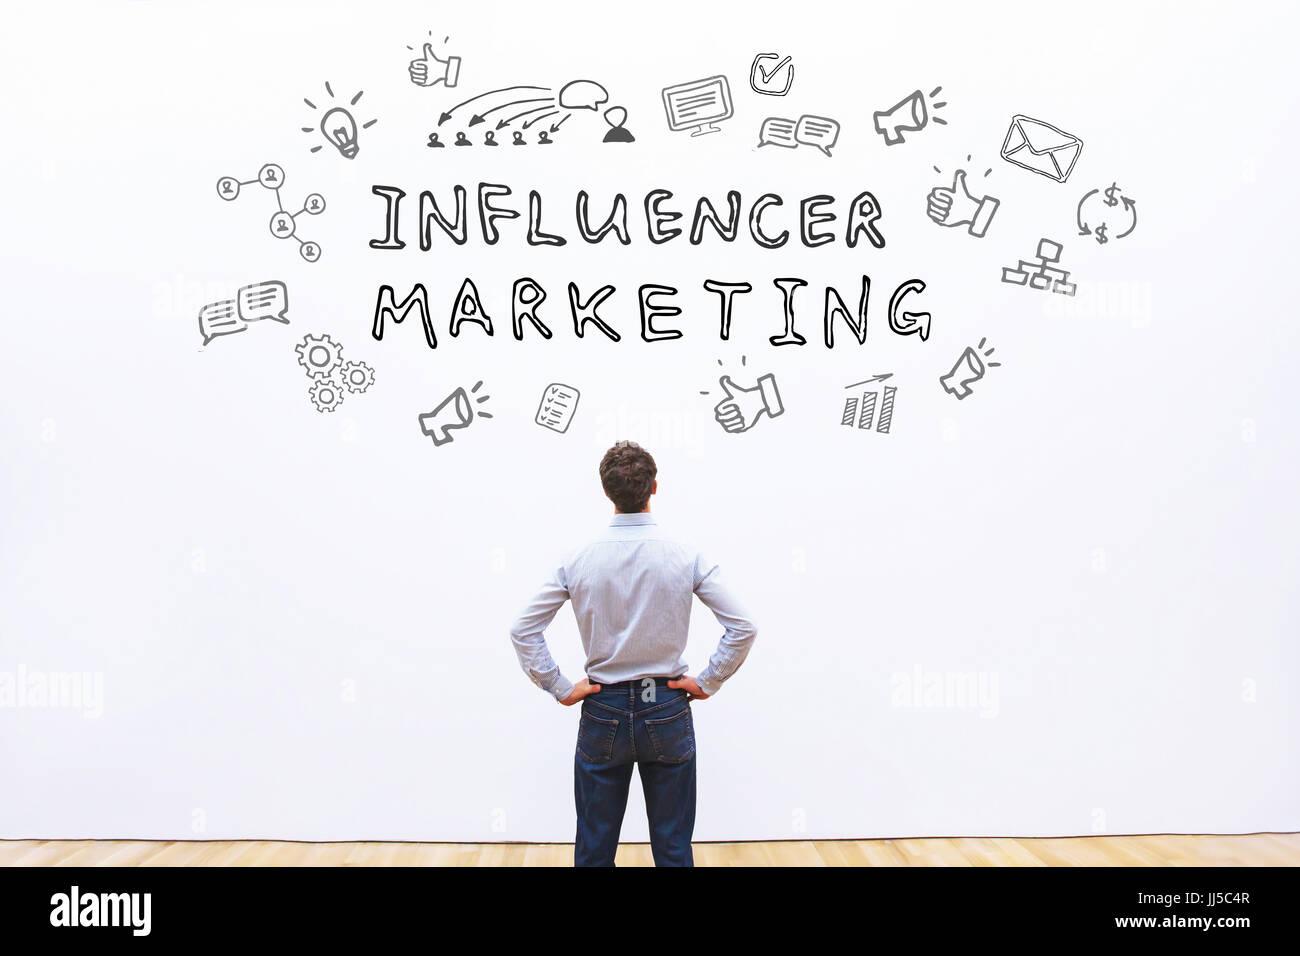 influencer marketing concept - Stock Image